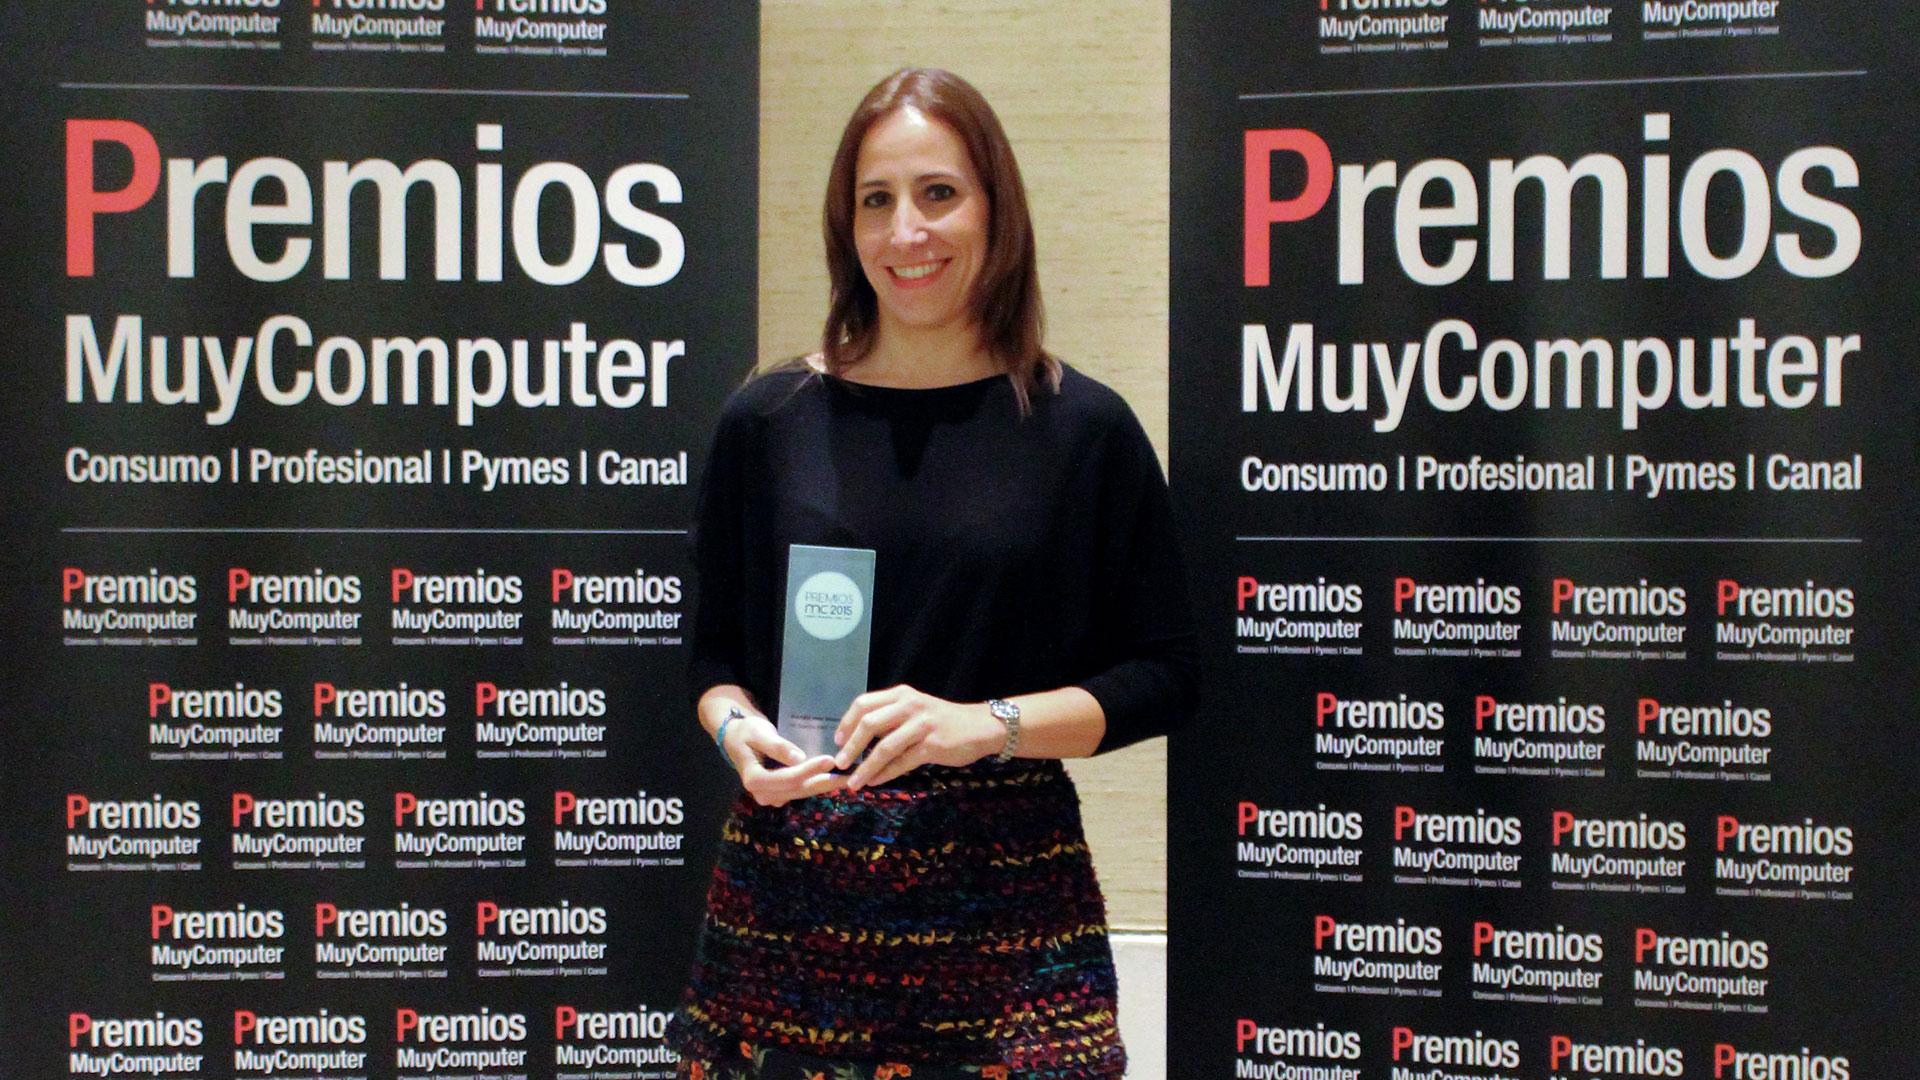 premios-mc2015-hp-spectre-x360-portatil-innovador